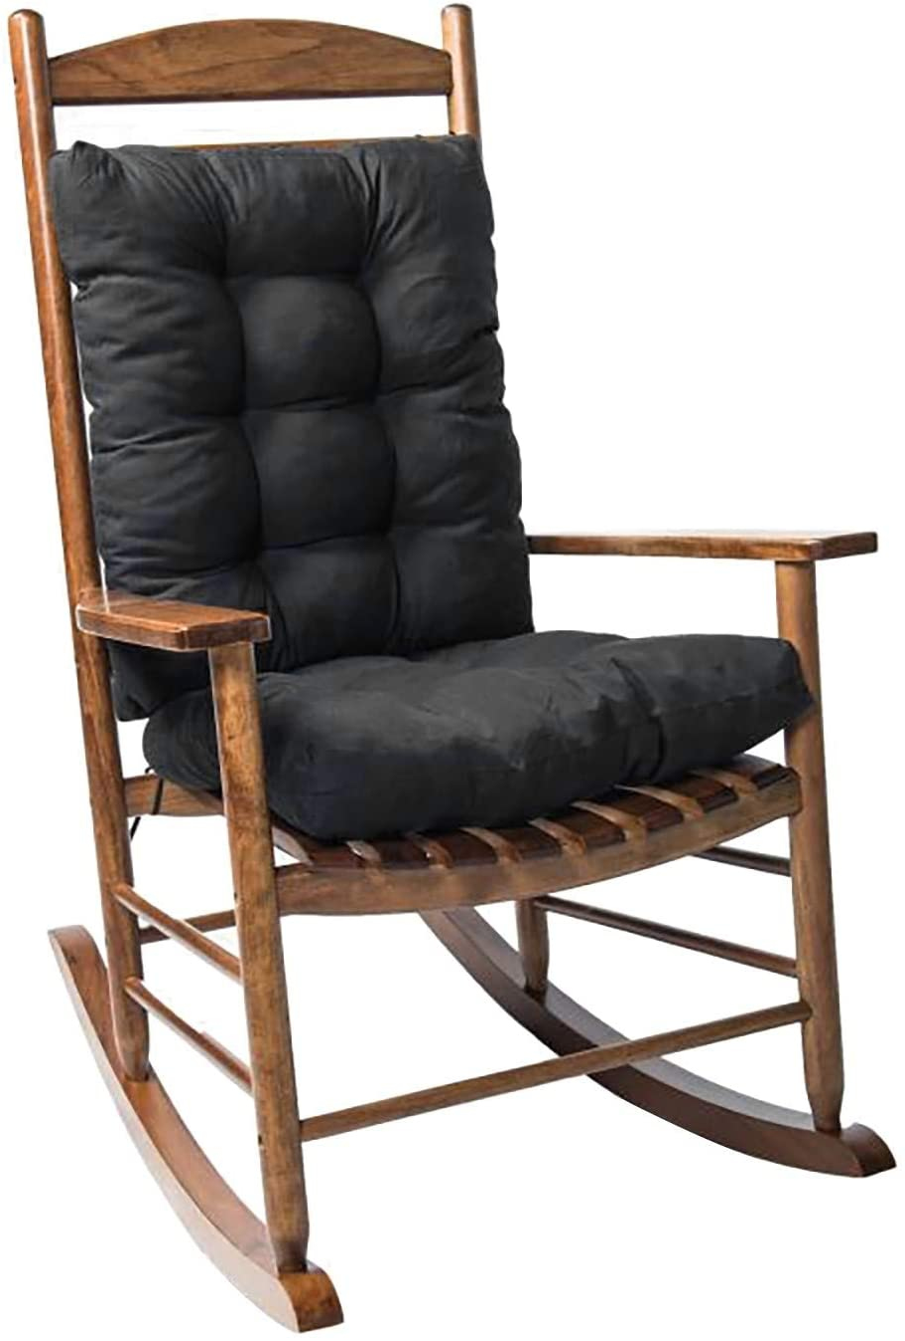 Outdoor Bench Seat Cushion Cotton Garden Furniture Loveseat Cushion Patio Non-Slip Lounger Chairs Back Cushions Seat Pillows